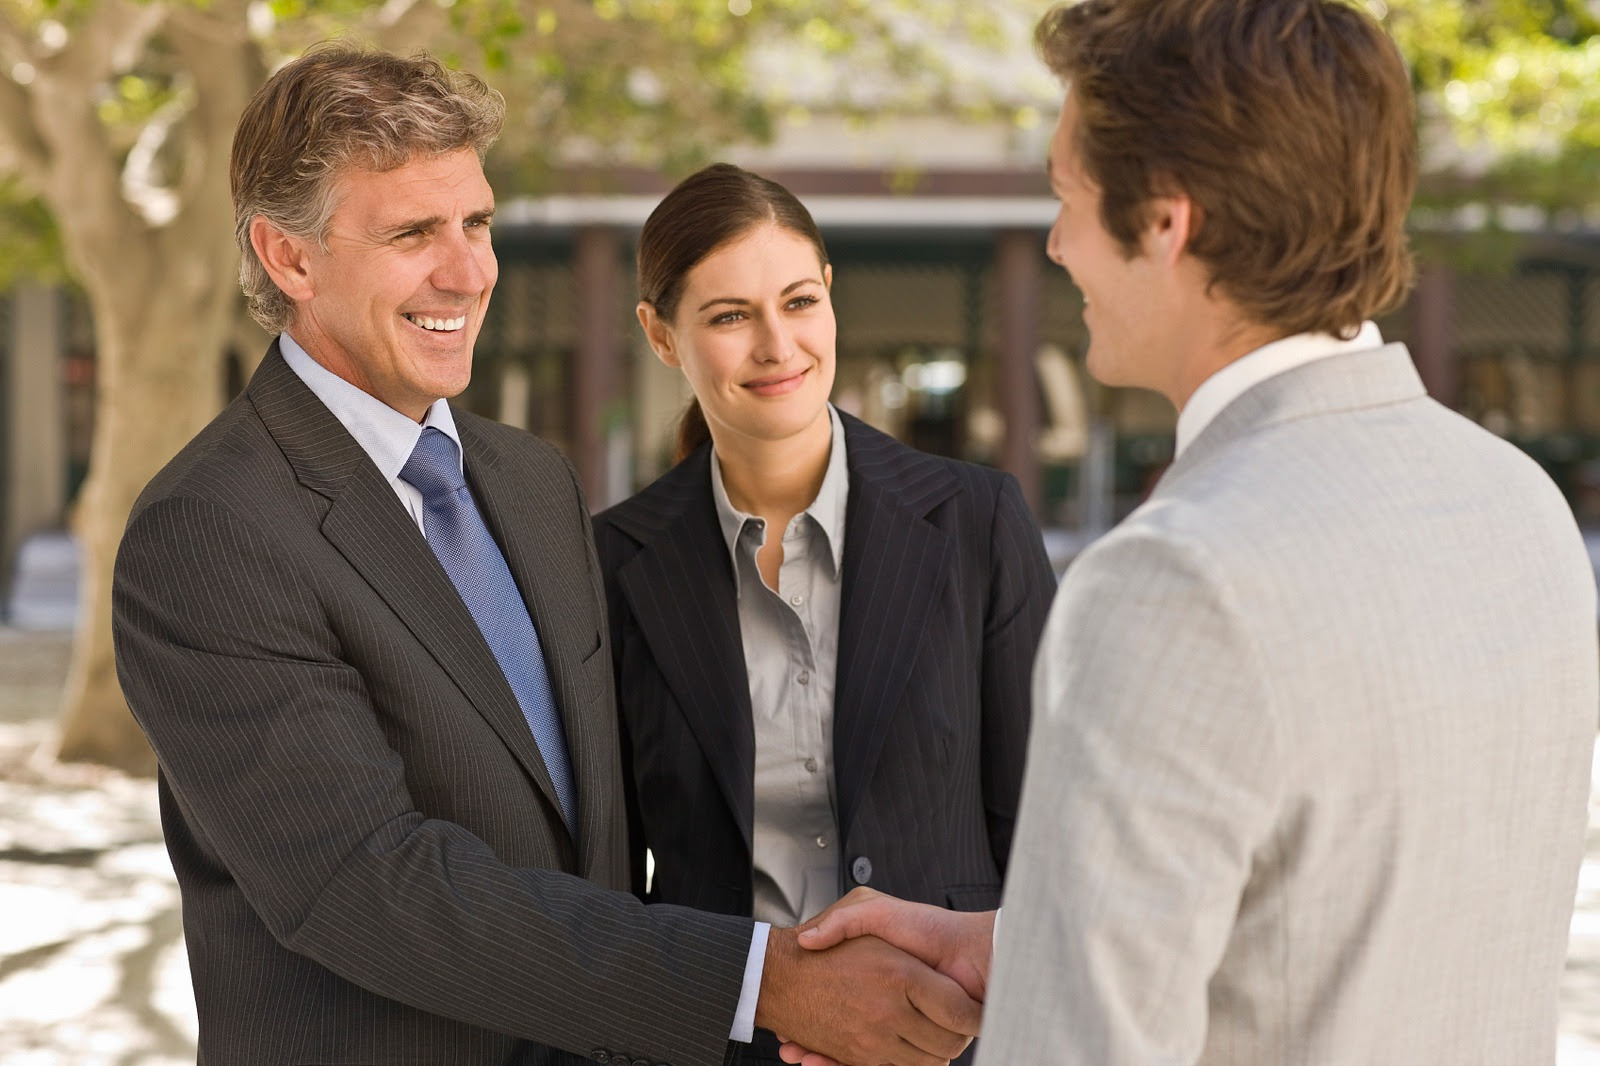 4 mistakes to avoid when hiring millennials